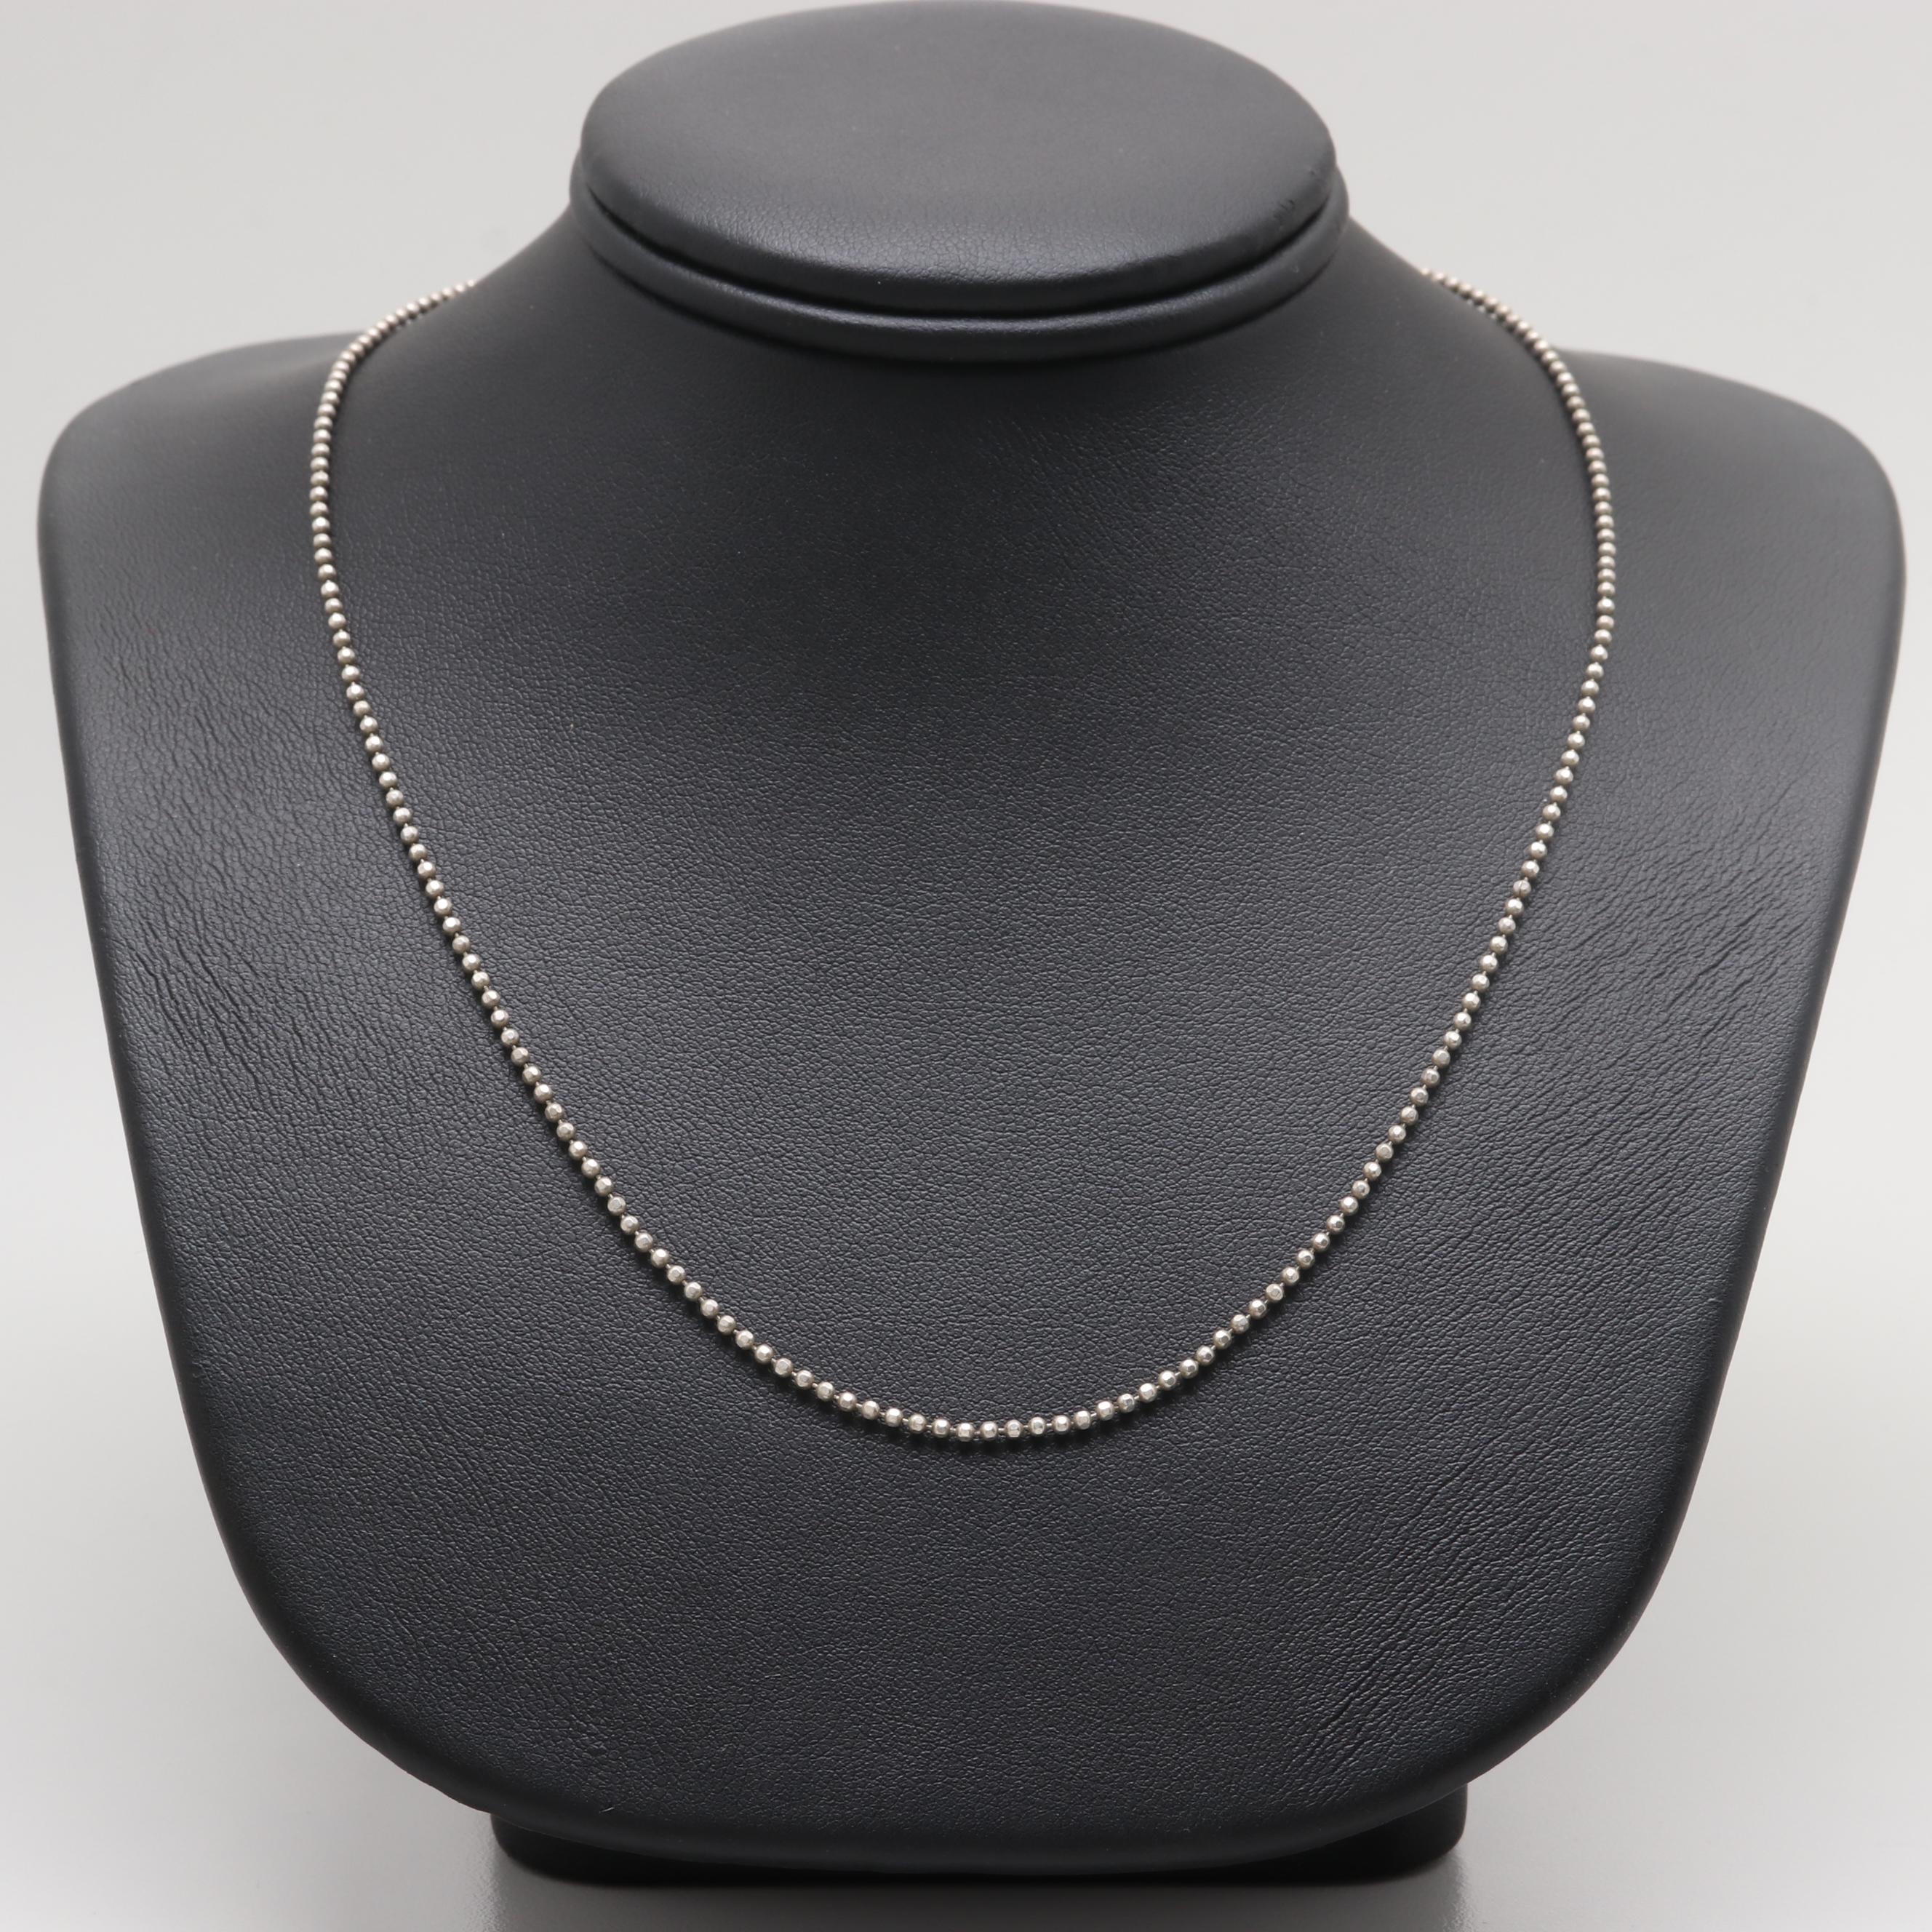 Danecraft Sterling Silver Chain Necklace